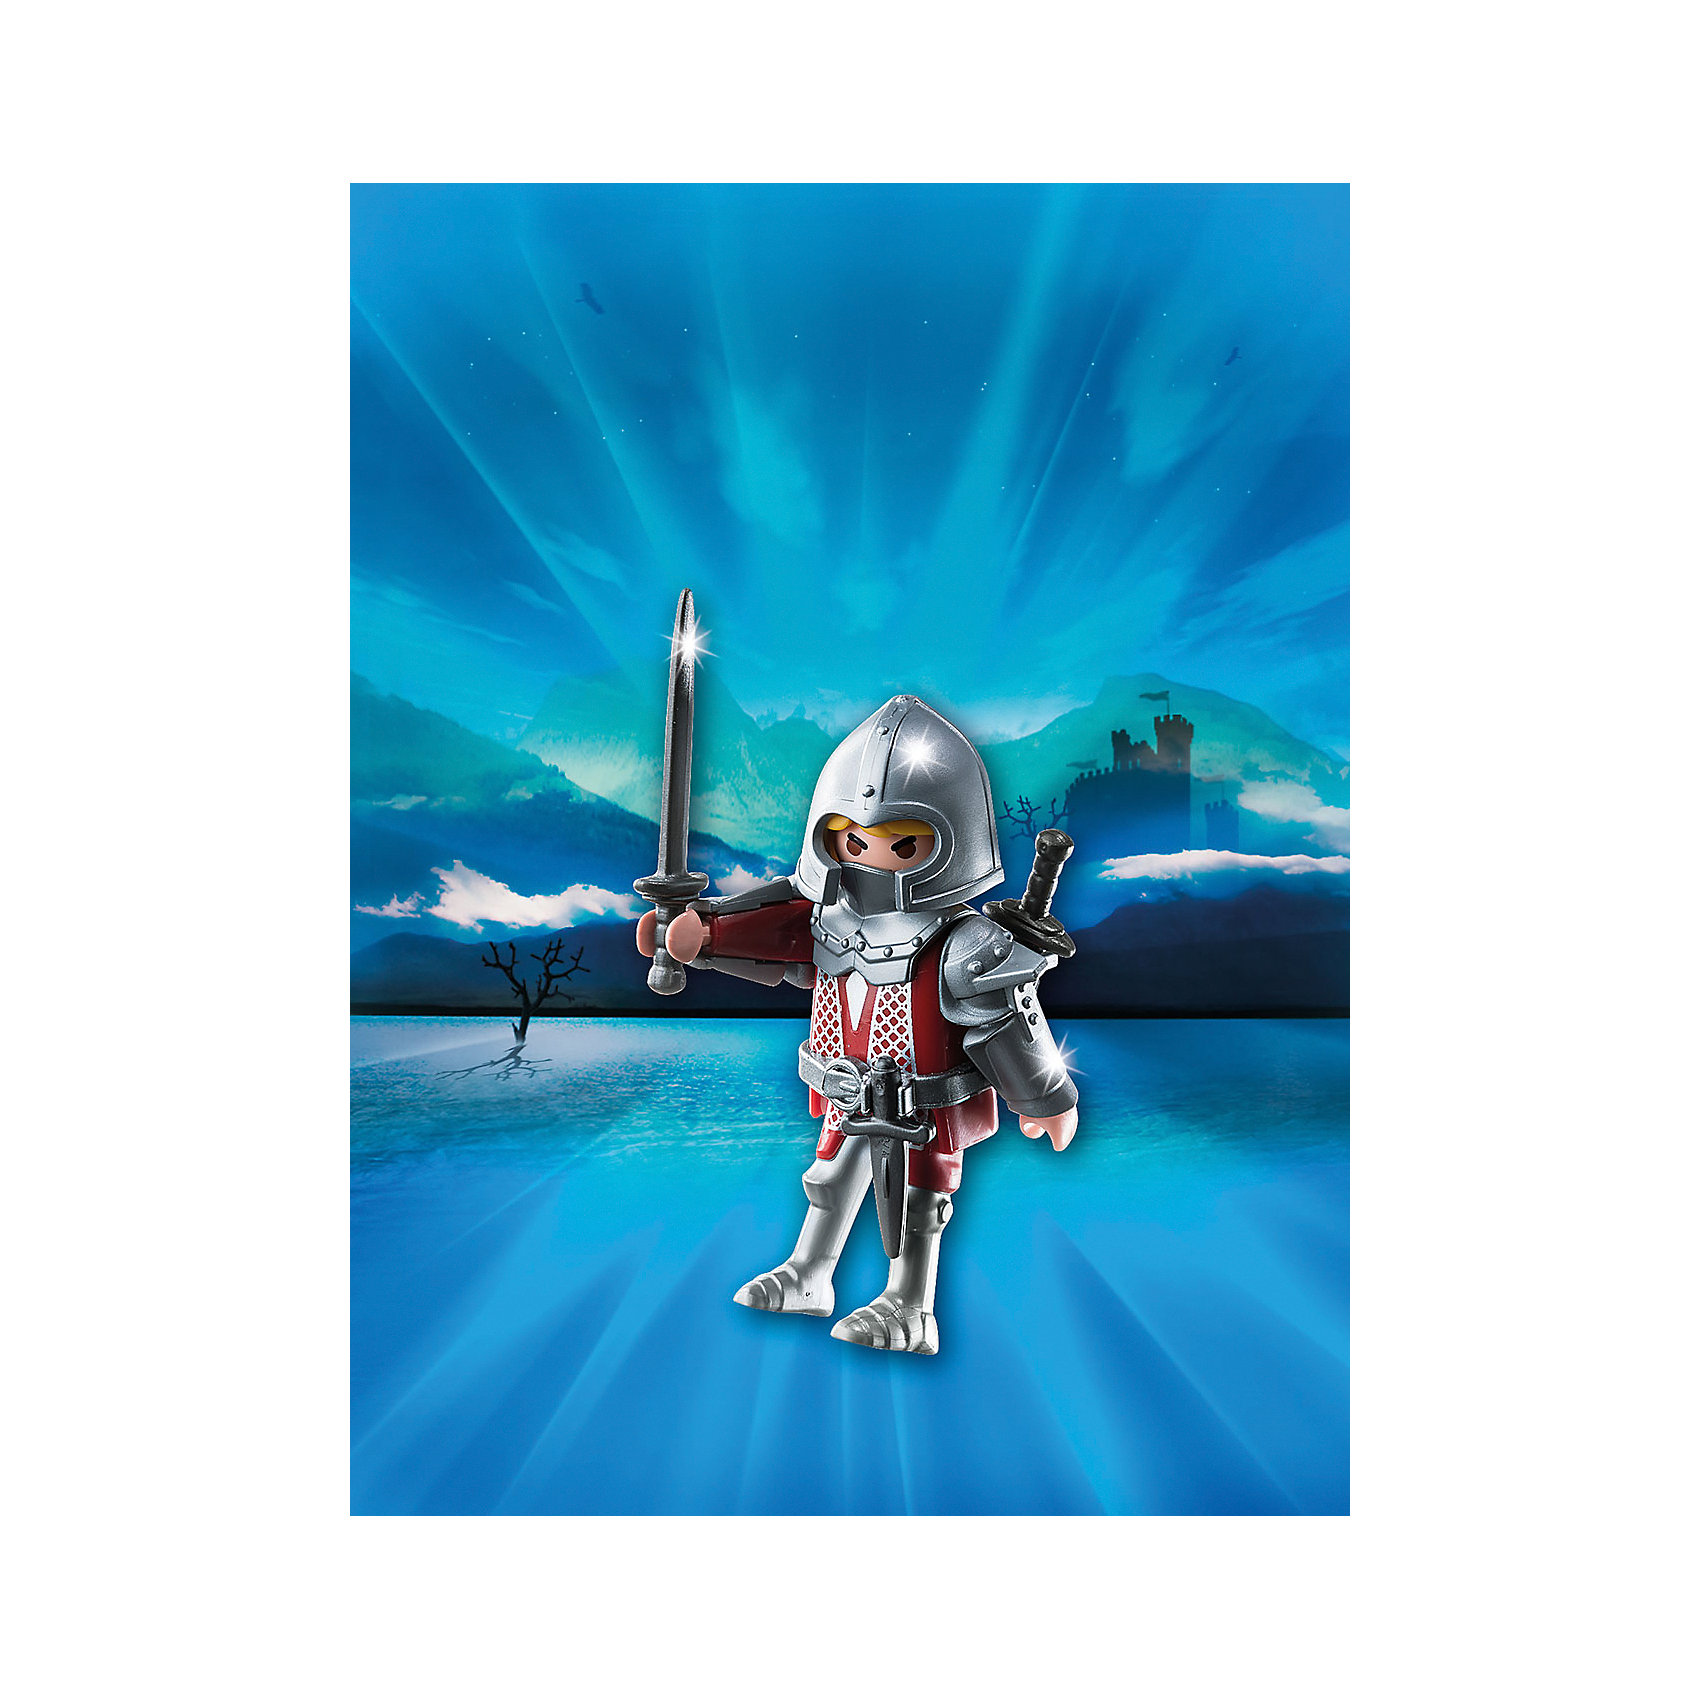 PLAYMOBIL® Друзья: Железный рыцарь, PLAYMOBIL a as39x x 390 strix r9 390x full coverage water cooled head water jacket